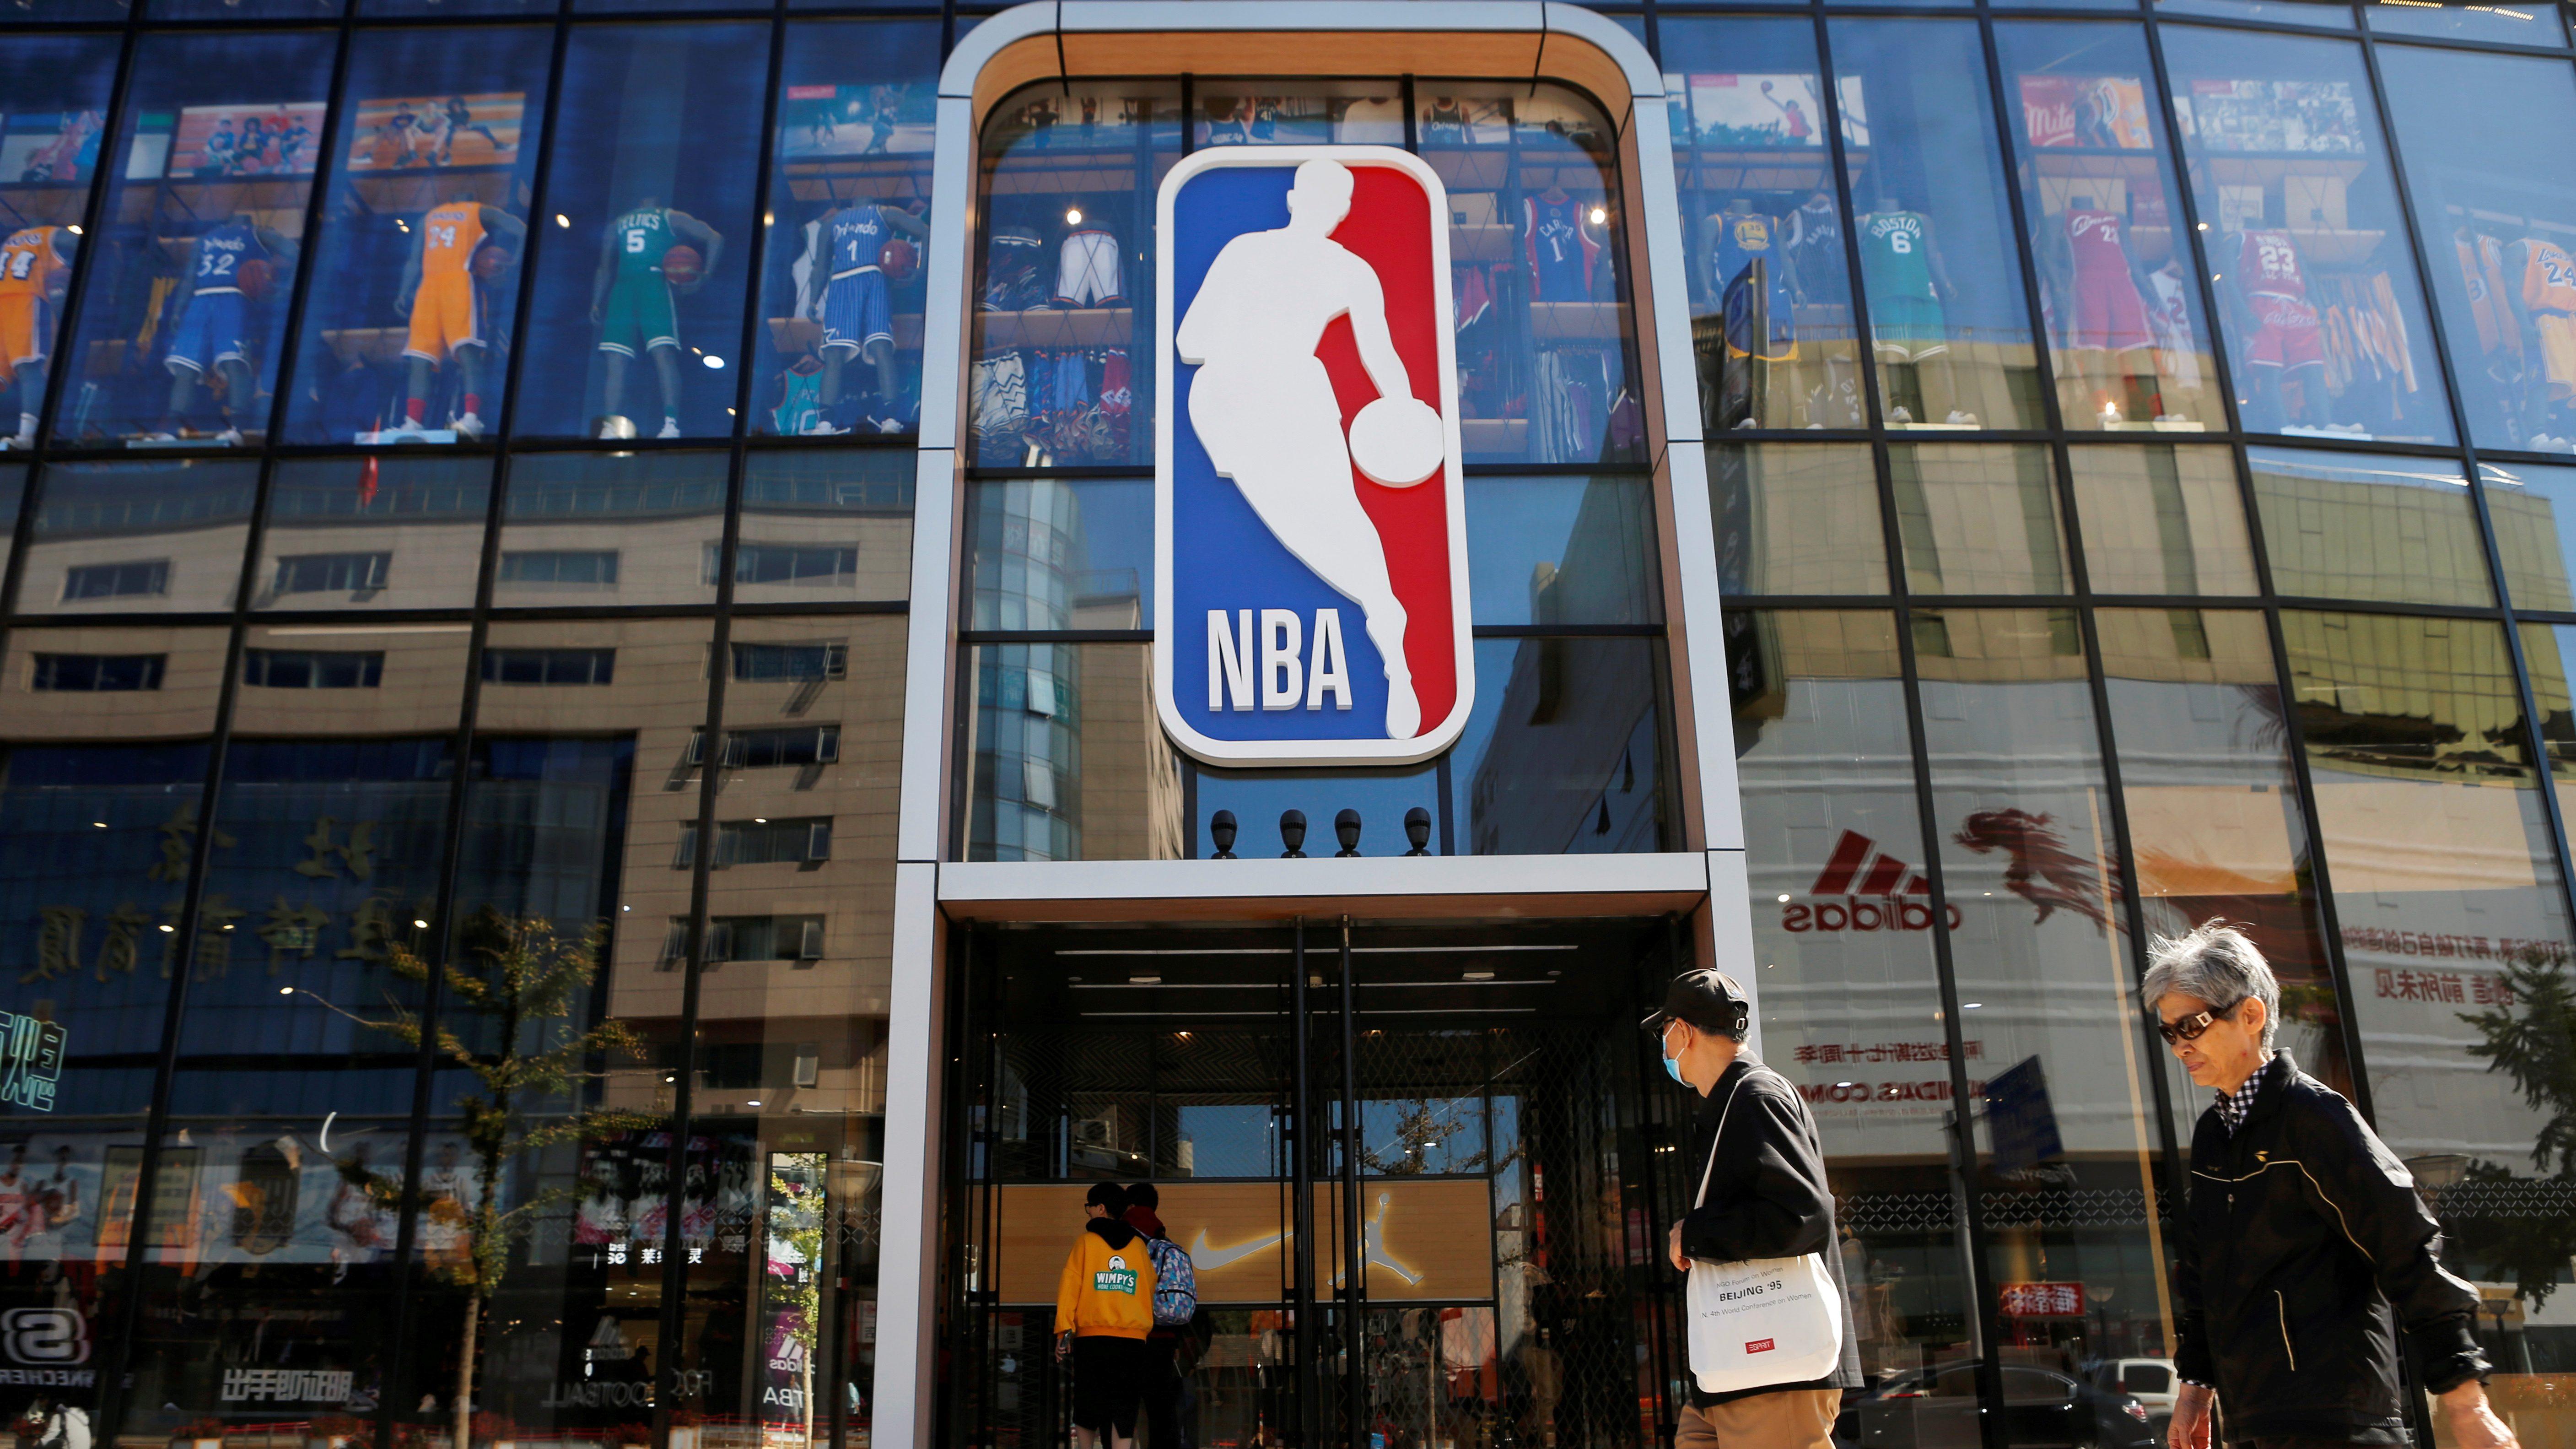 People enter a flagship NBA store at the Wangfujing shopping street in Beijing, China